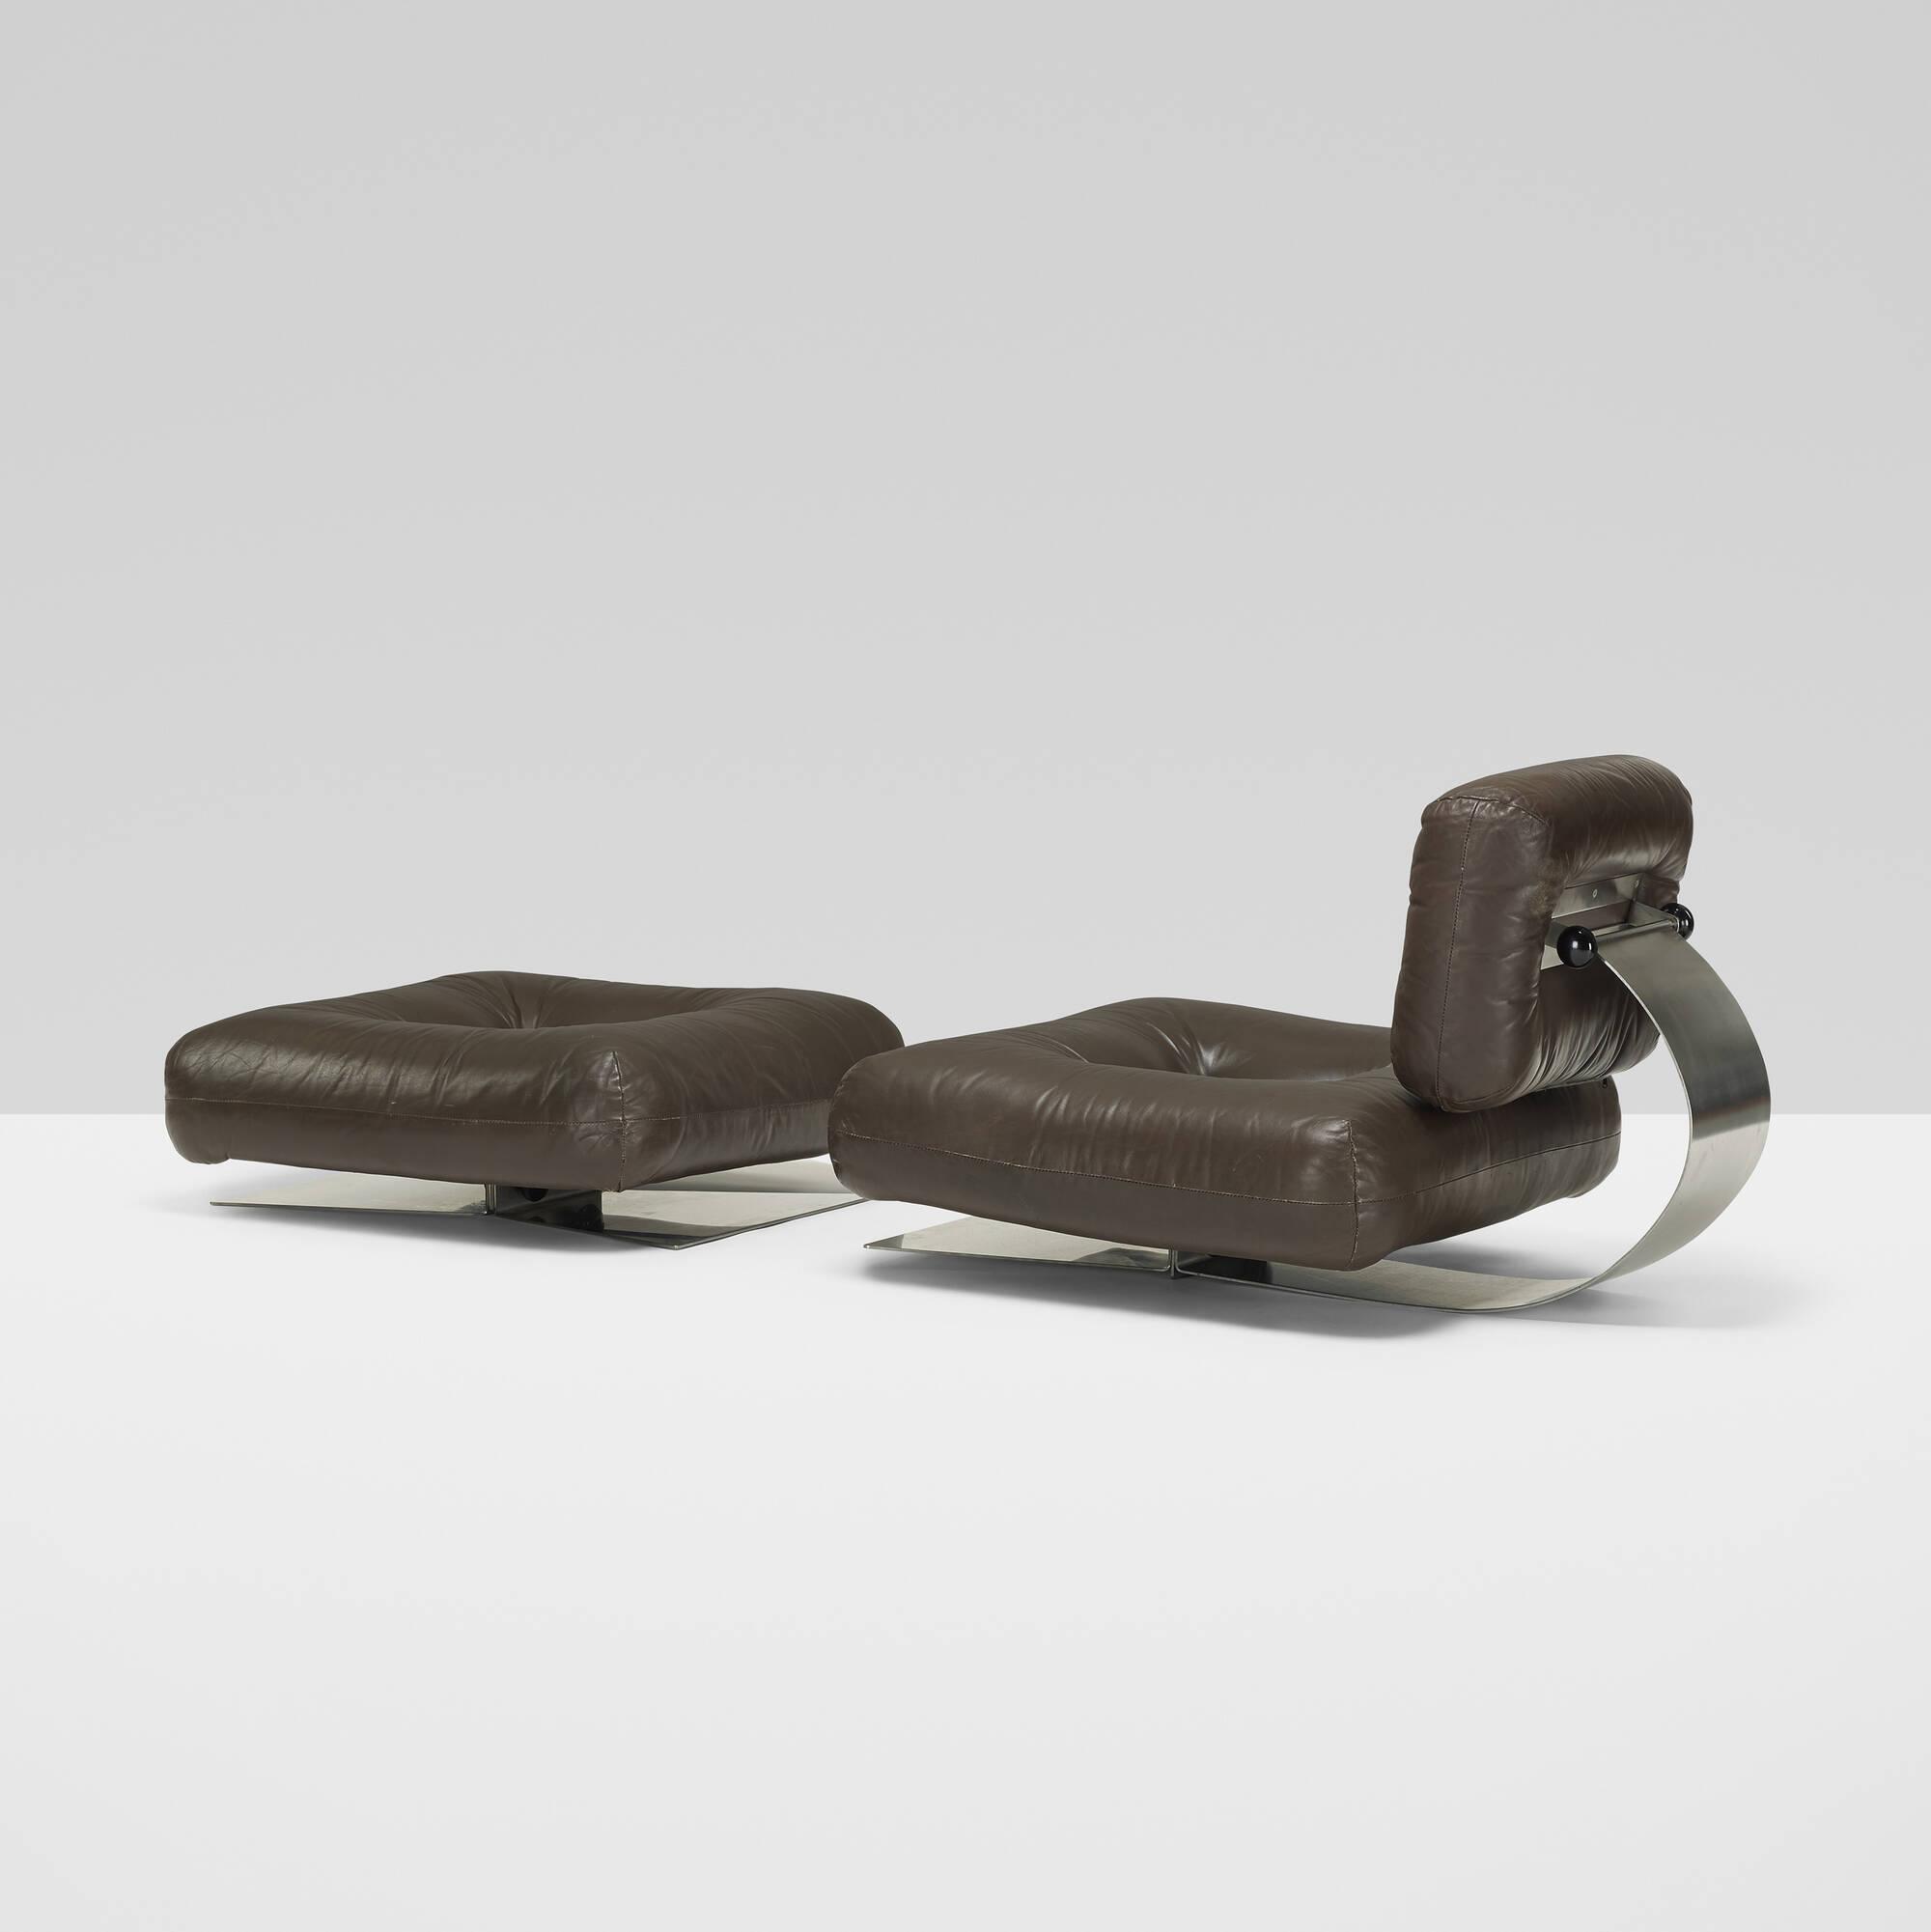 334 Oscar Niemeyer Lounge Chair And Ottoman